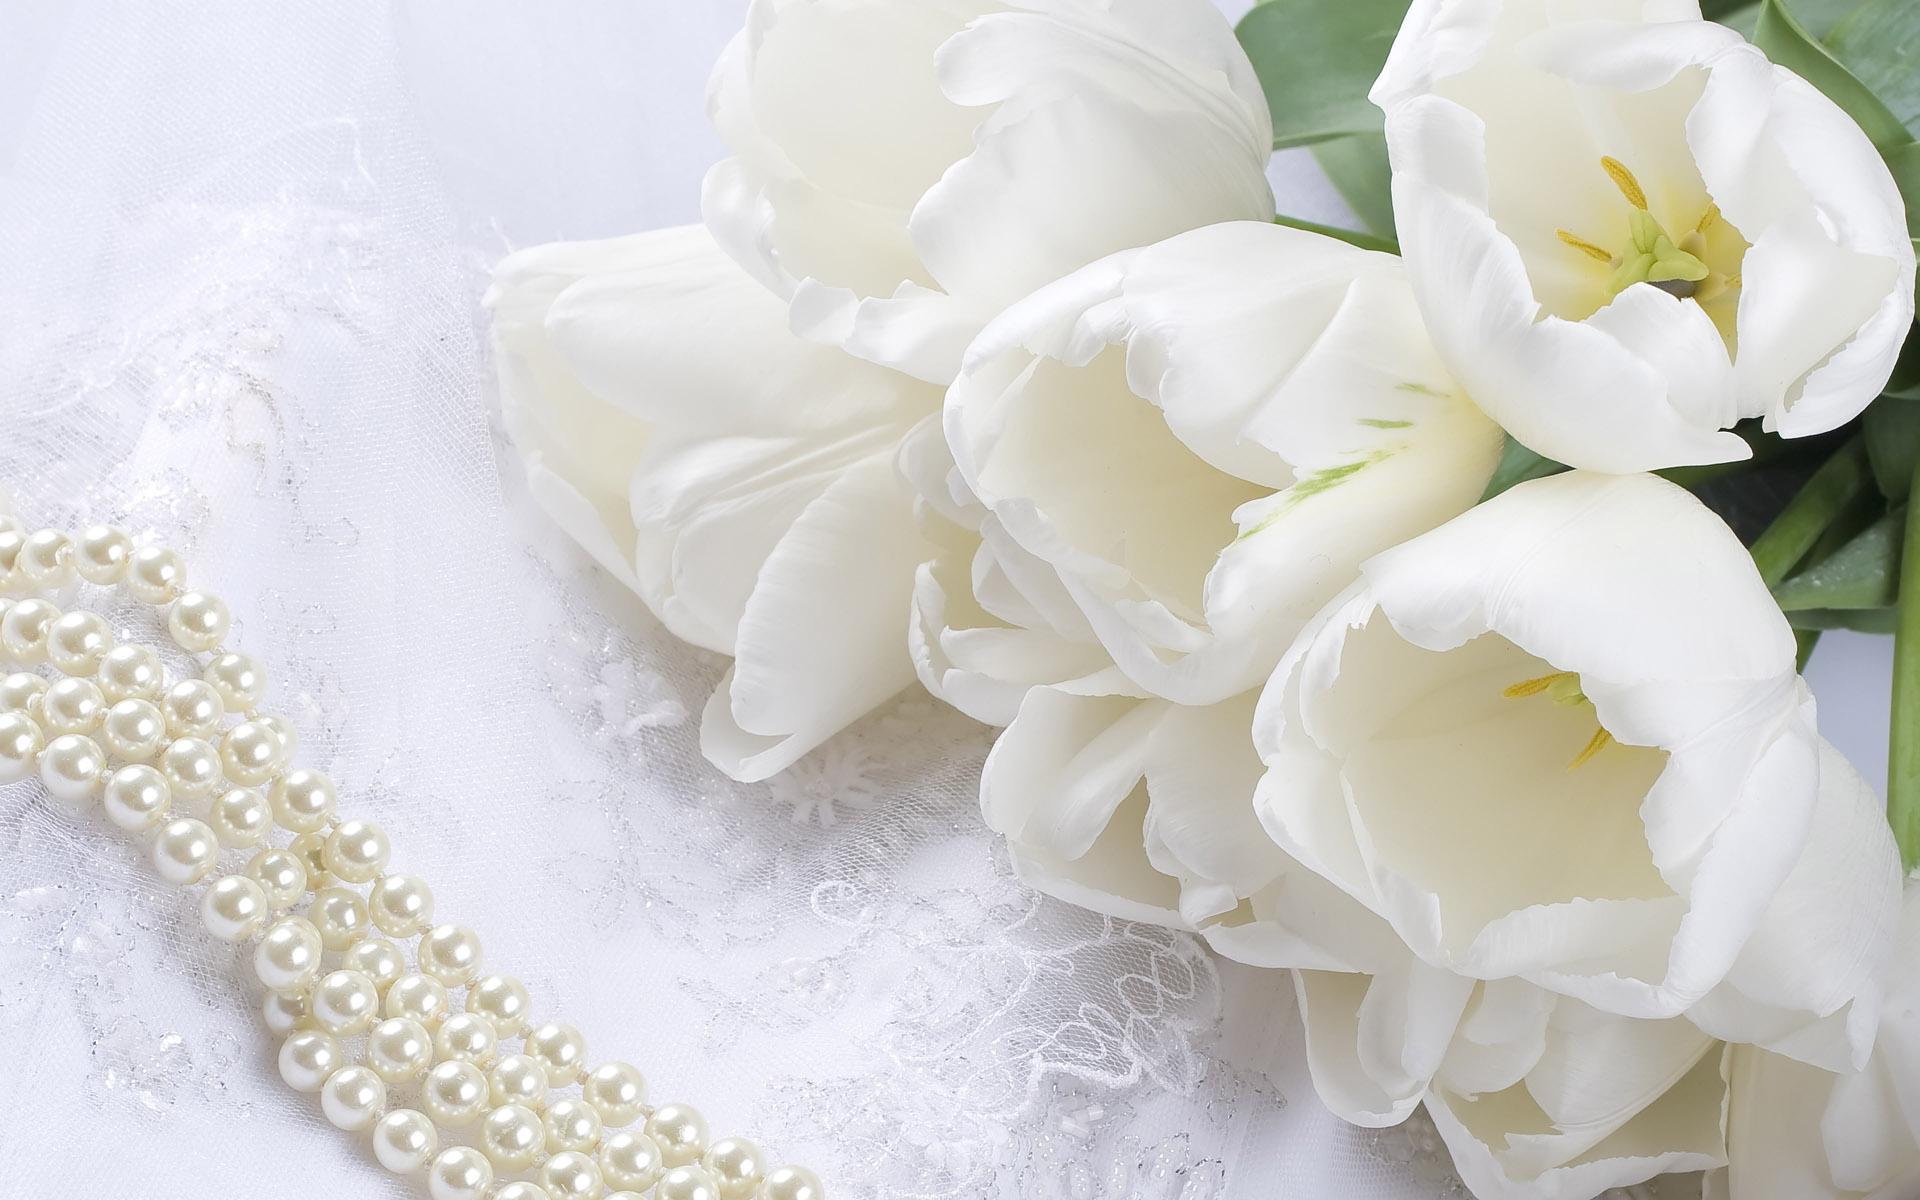 white flowers hd wallpapers wedding flowers desktop images 1920x1200